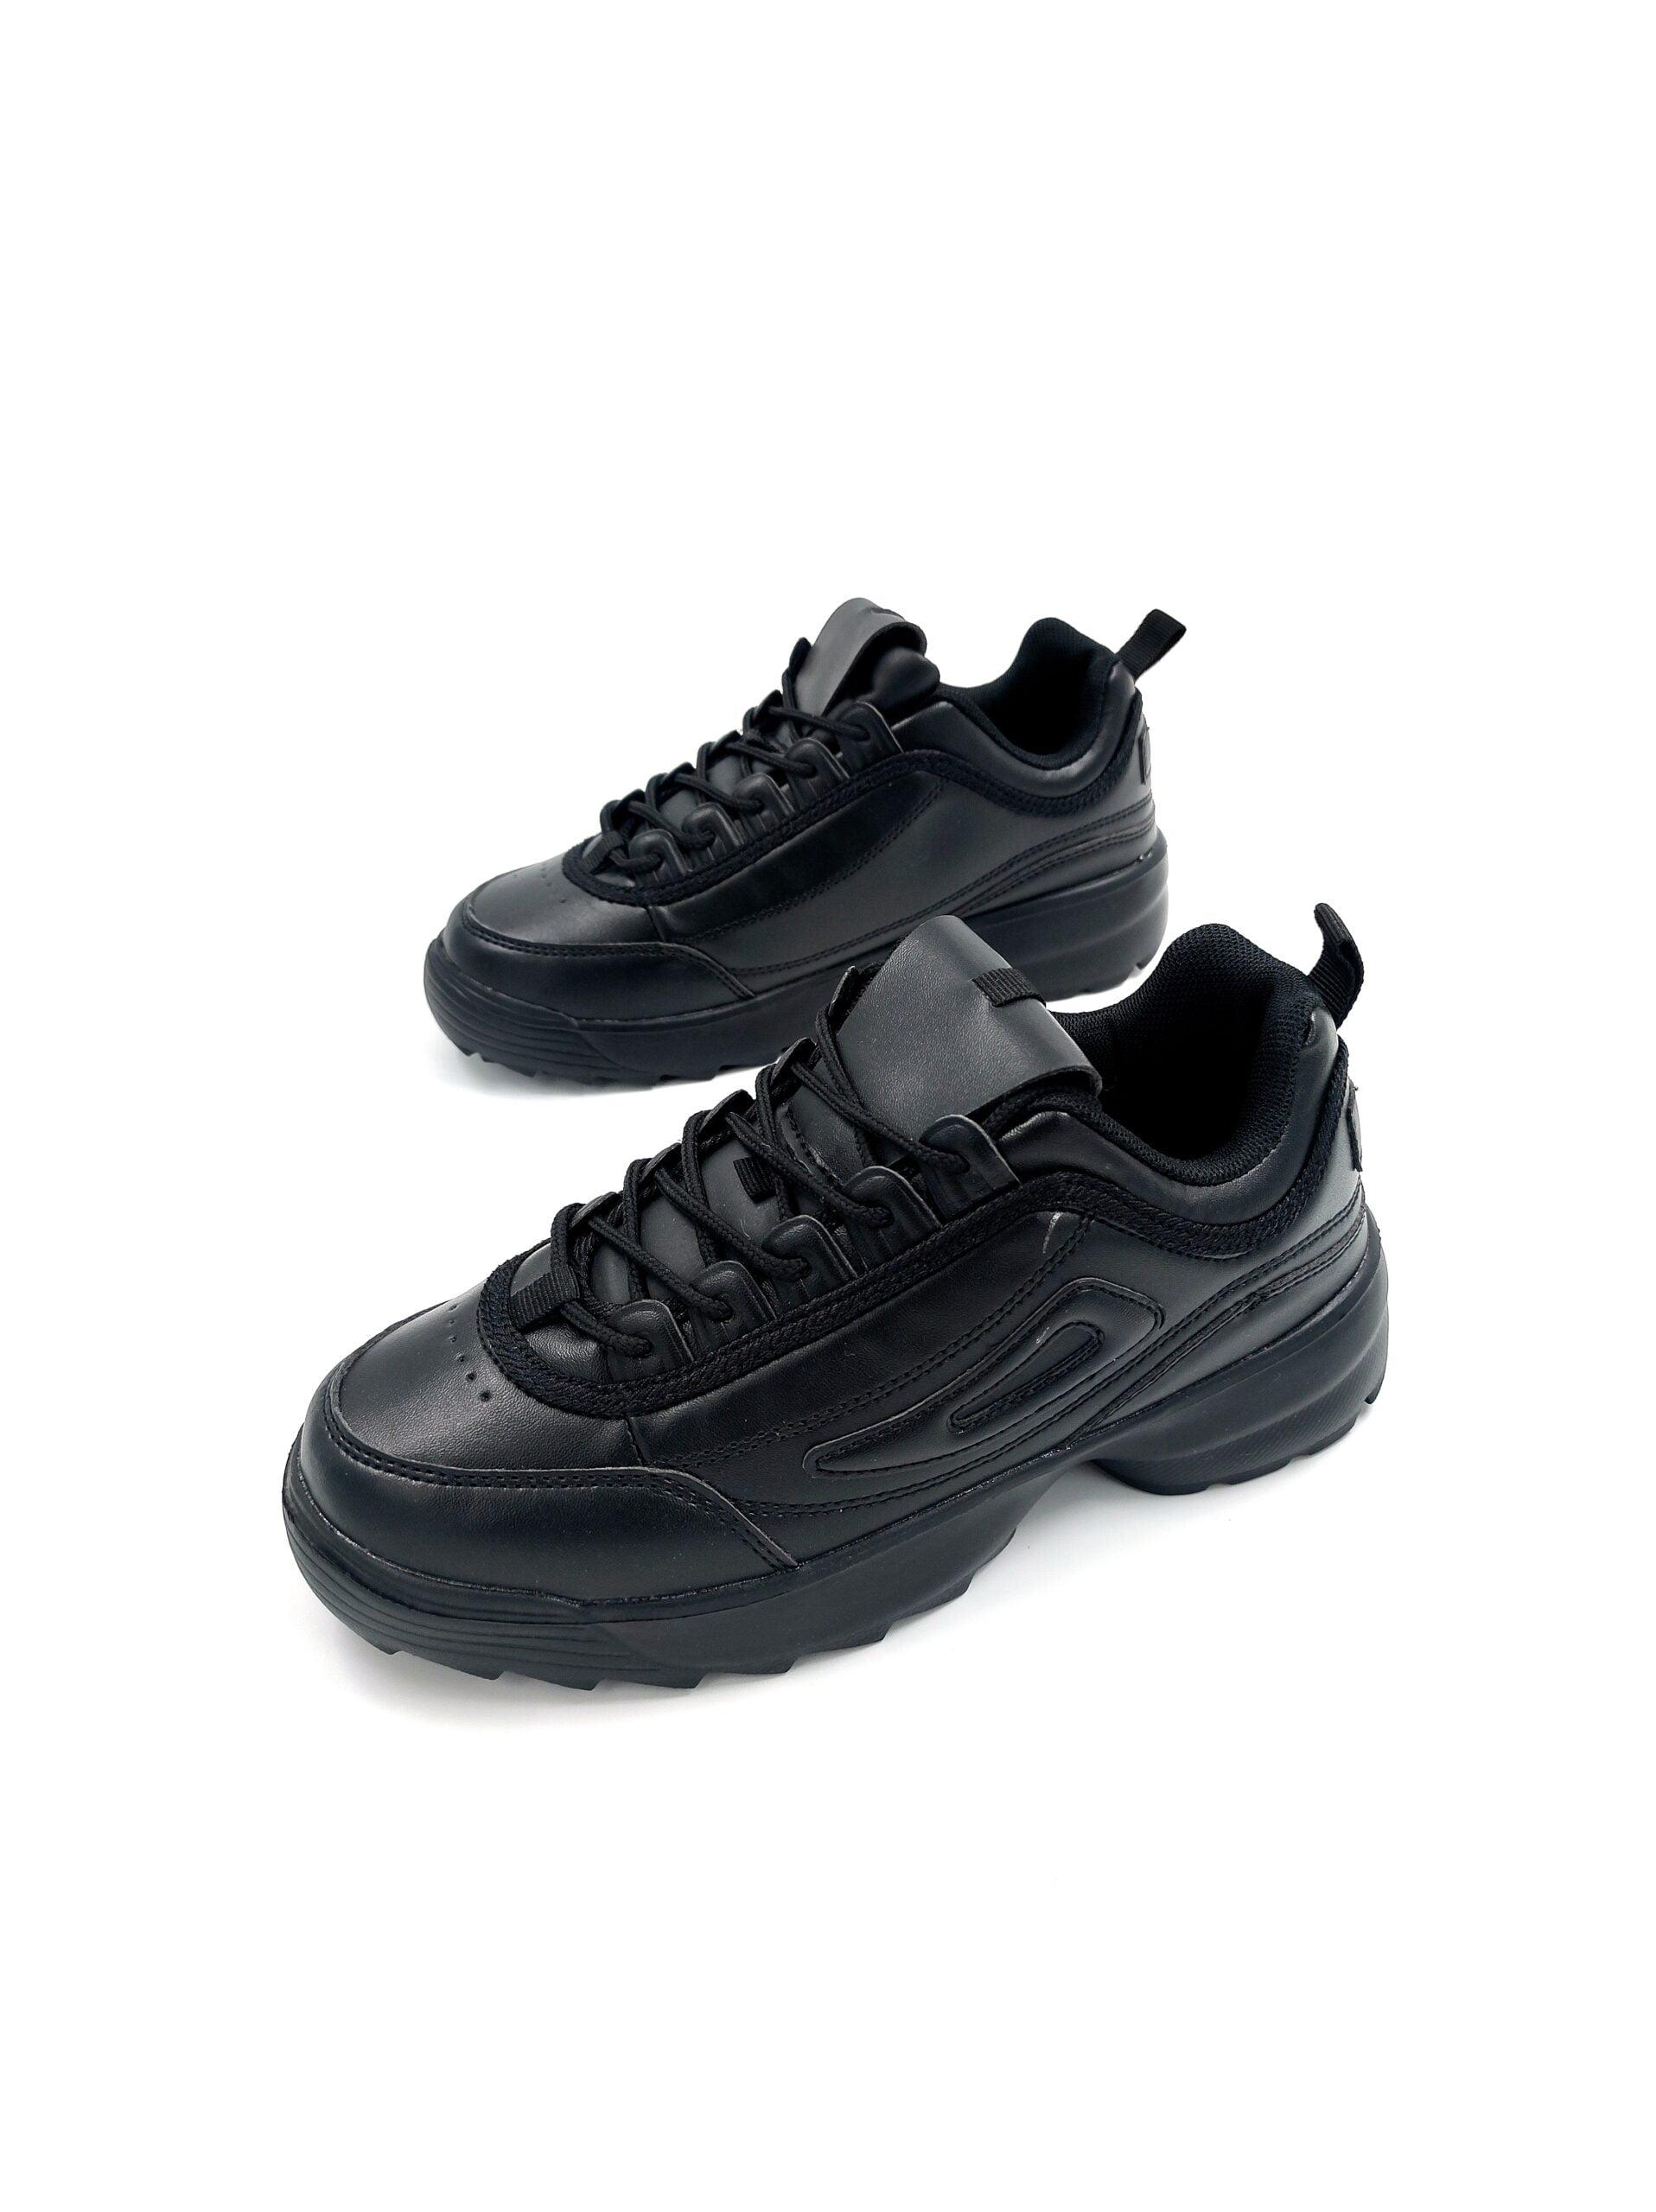 Sneakers με Ανάγλυφο Σχέδιο Black